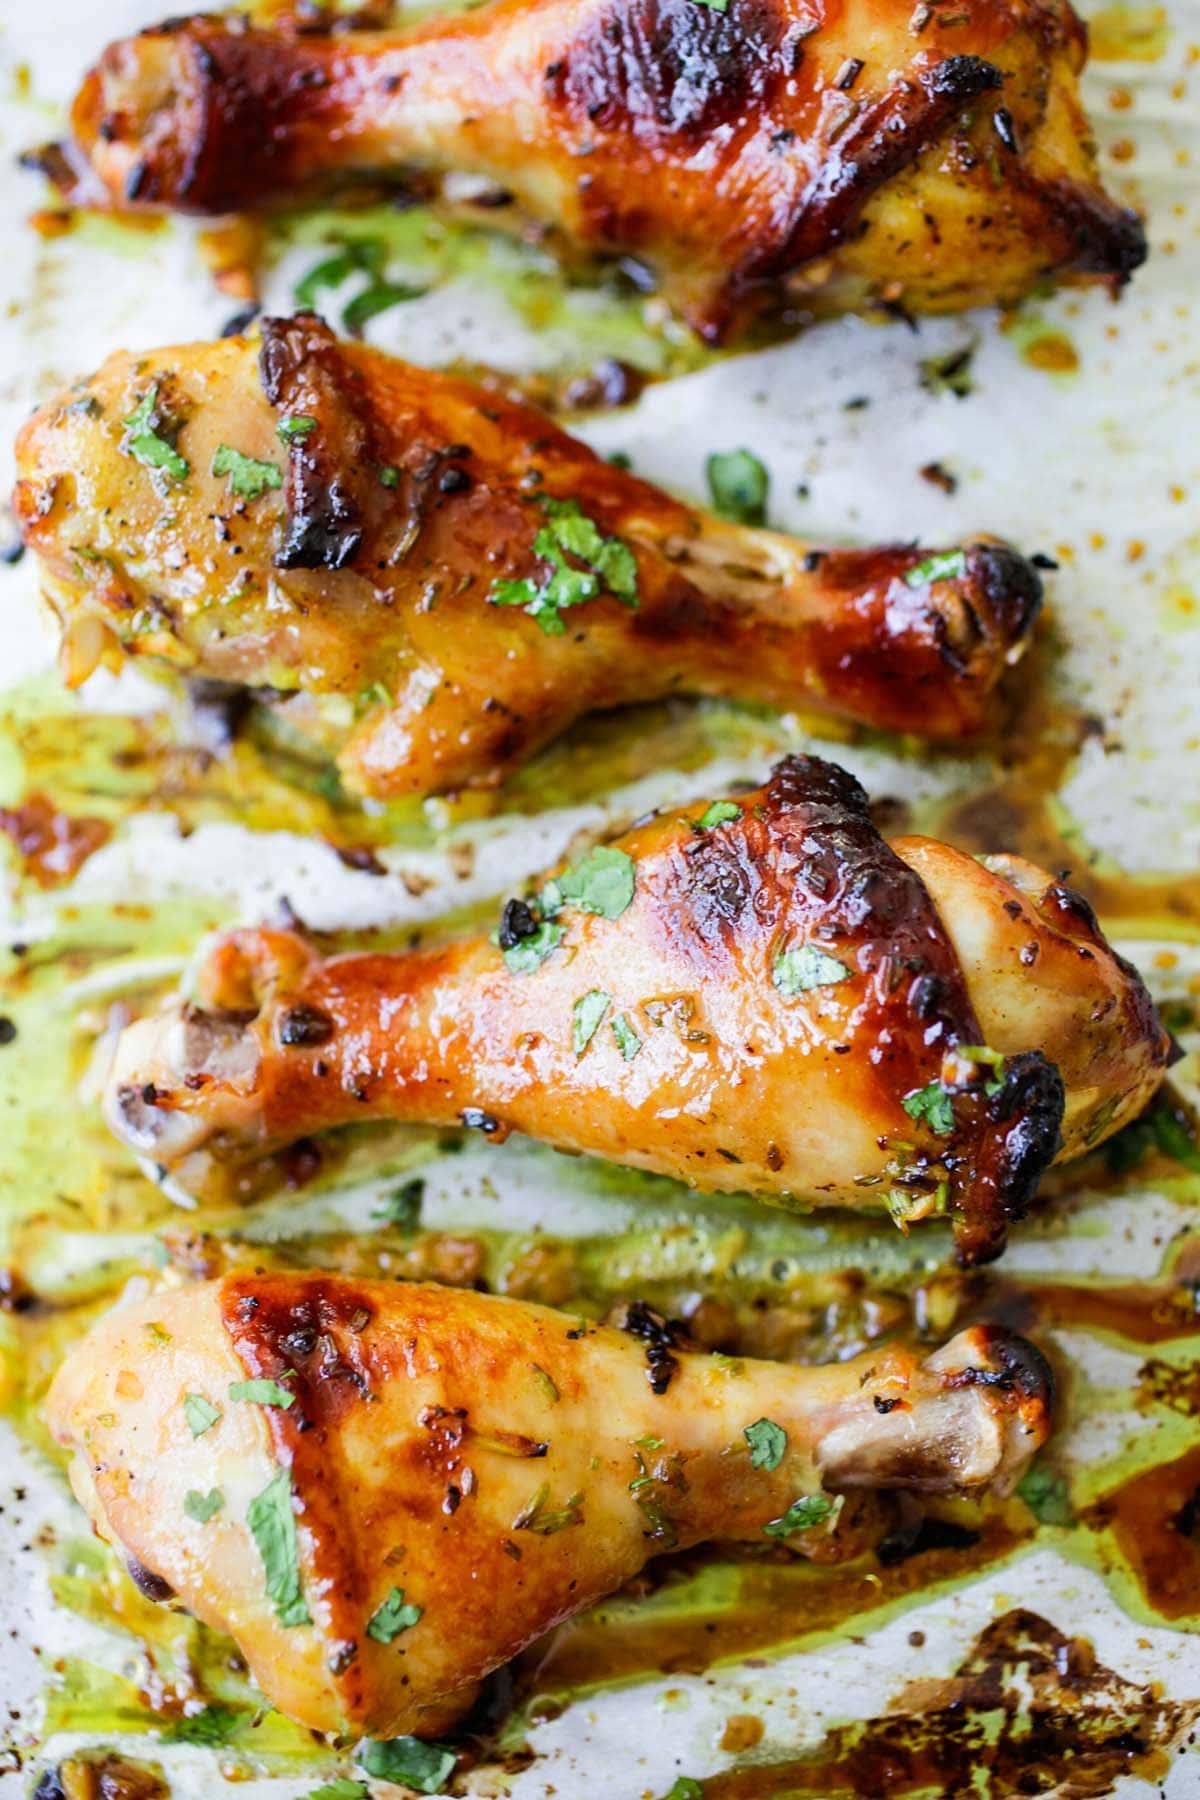 Glazed roasted Thai chicken drumsticks in easy Asian sauce.